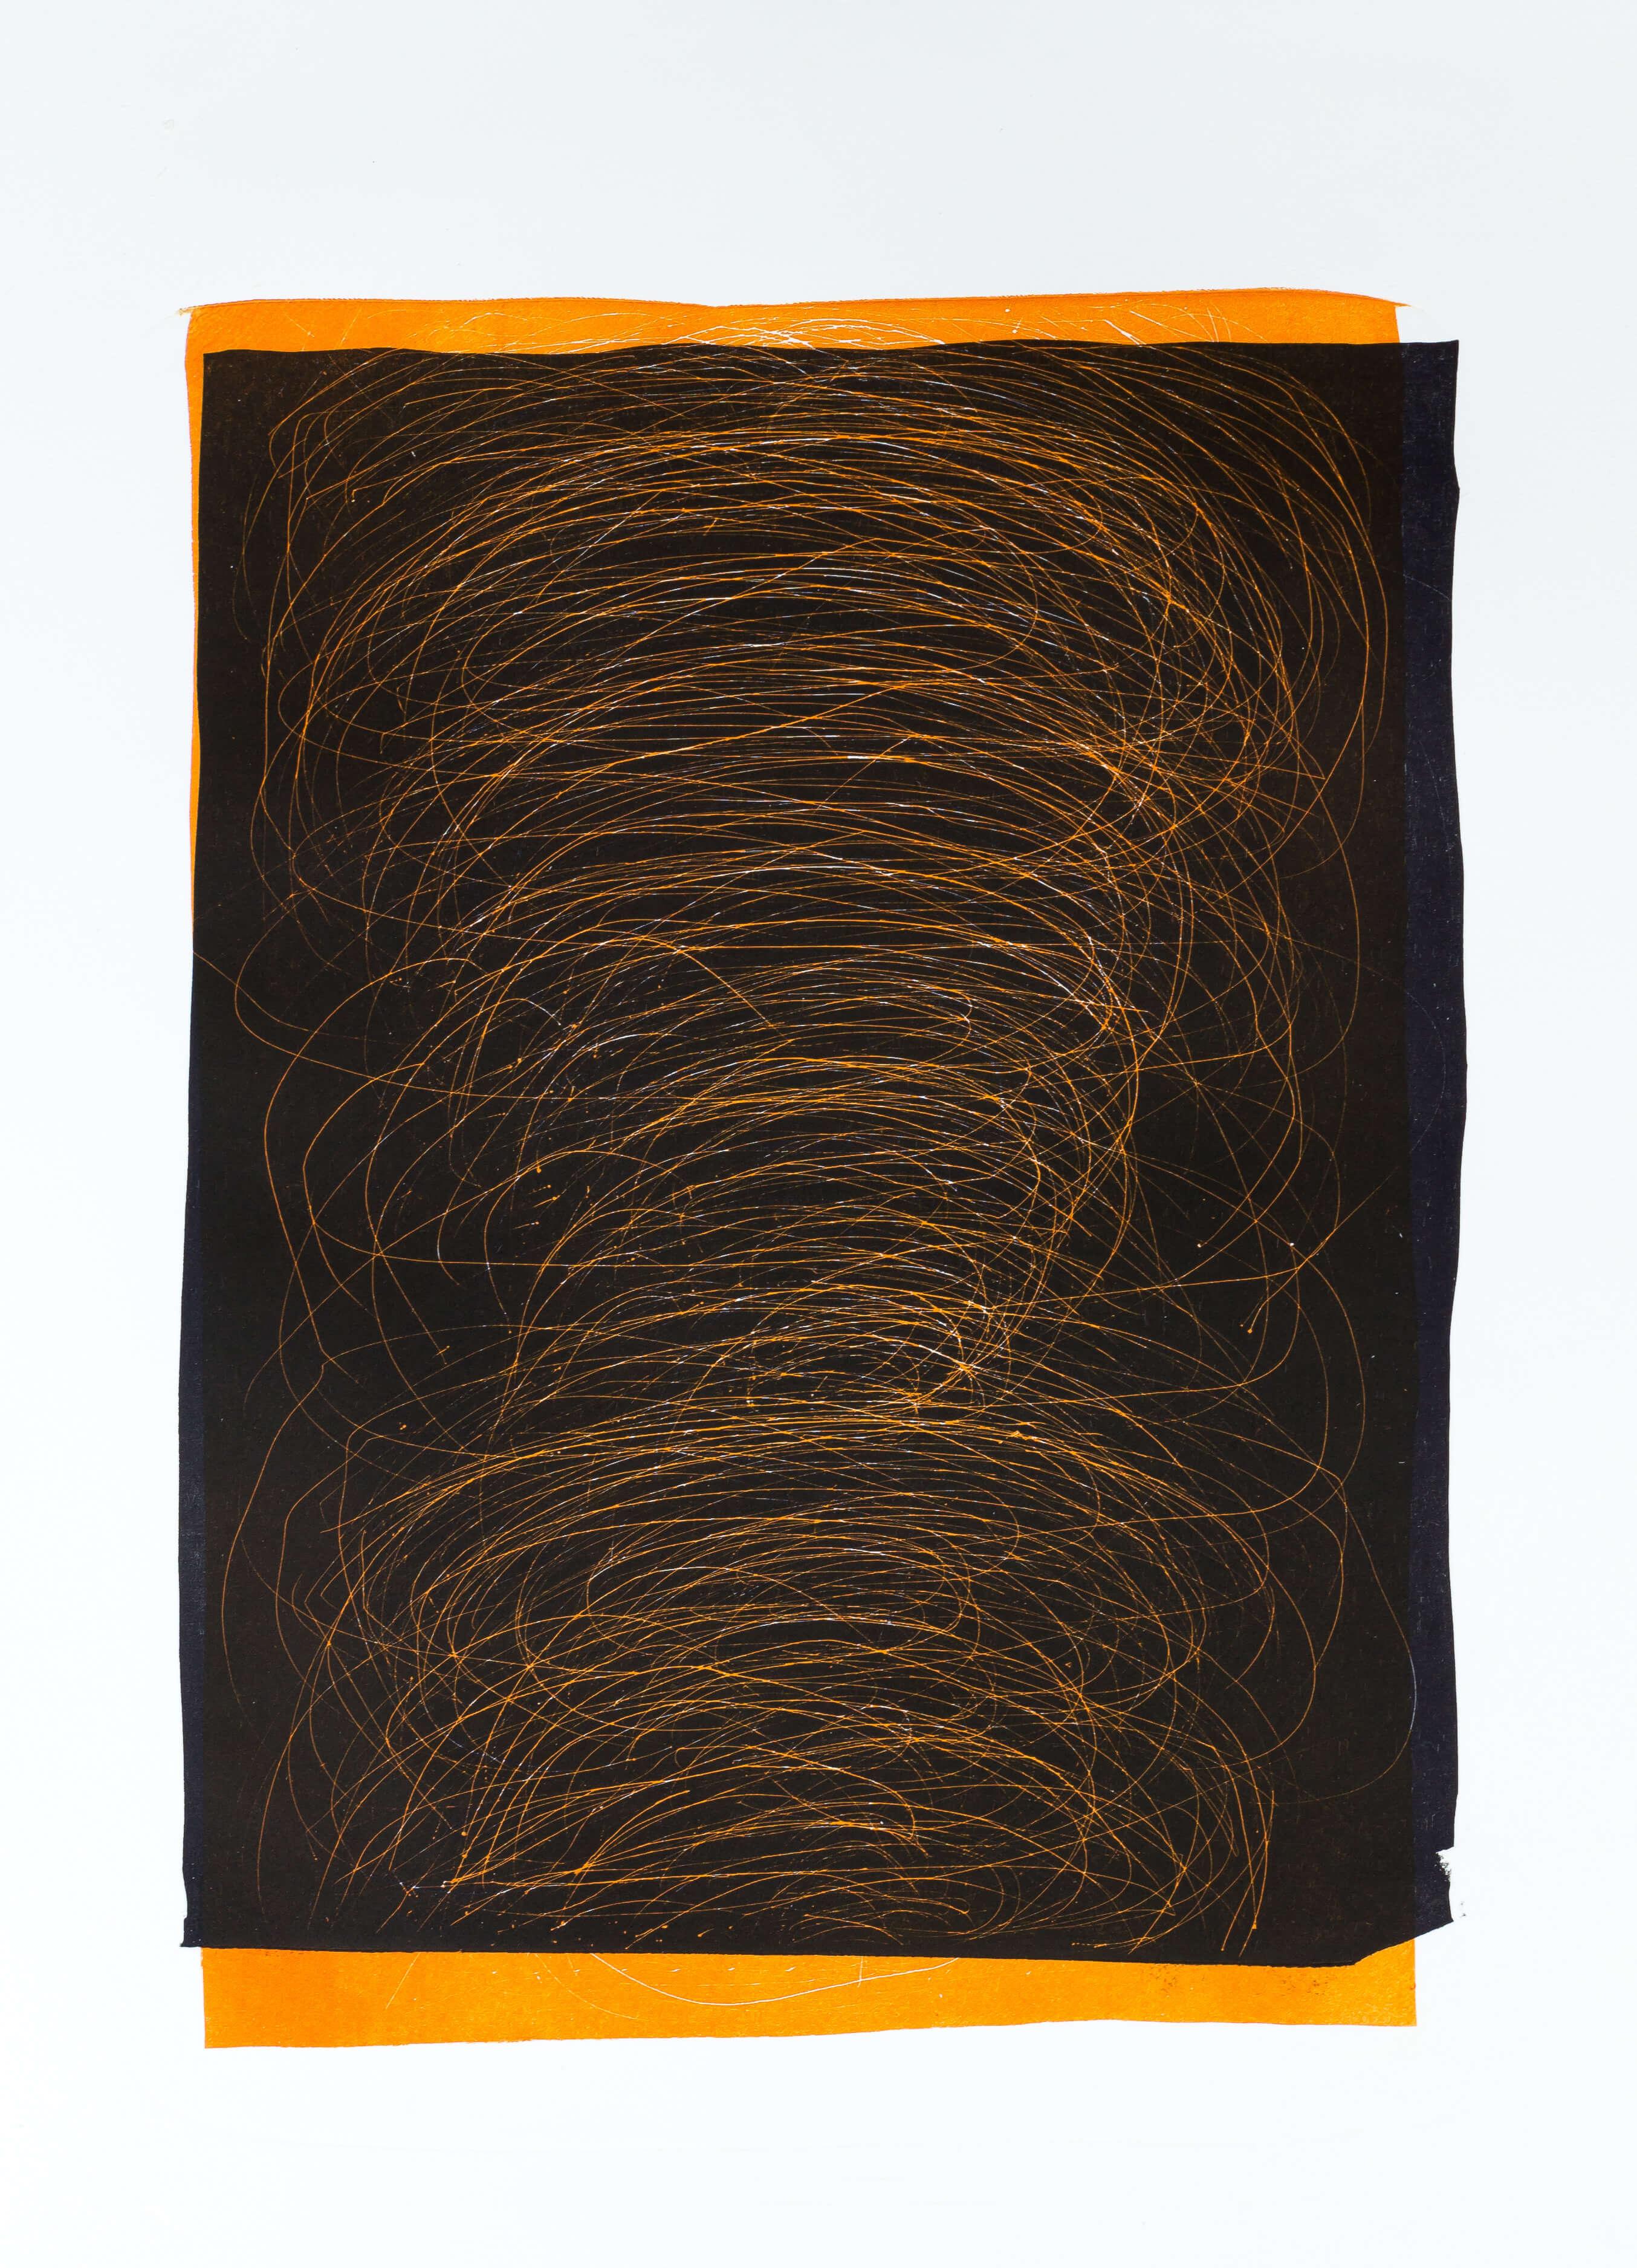 Katharina Albers, Transformation VI.I, 2011, Schablithographie, Unikat, 46,5x29,5cm